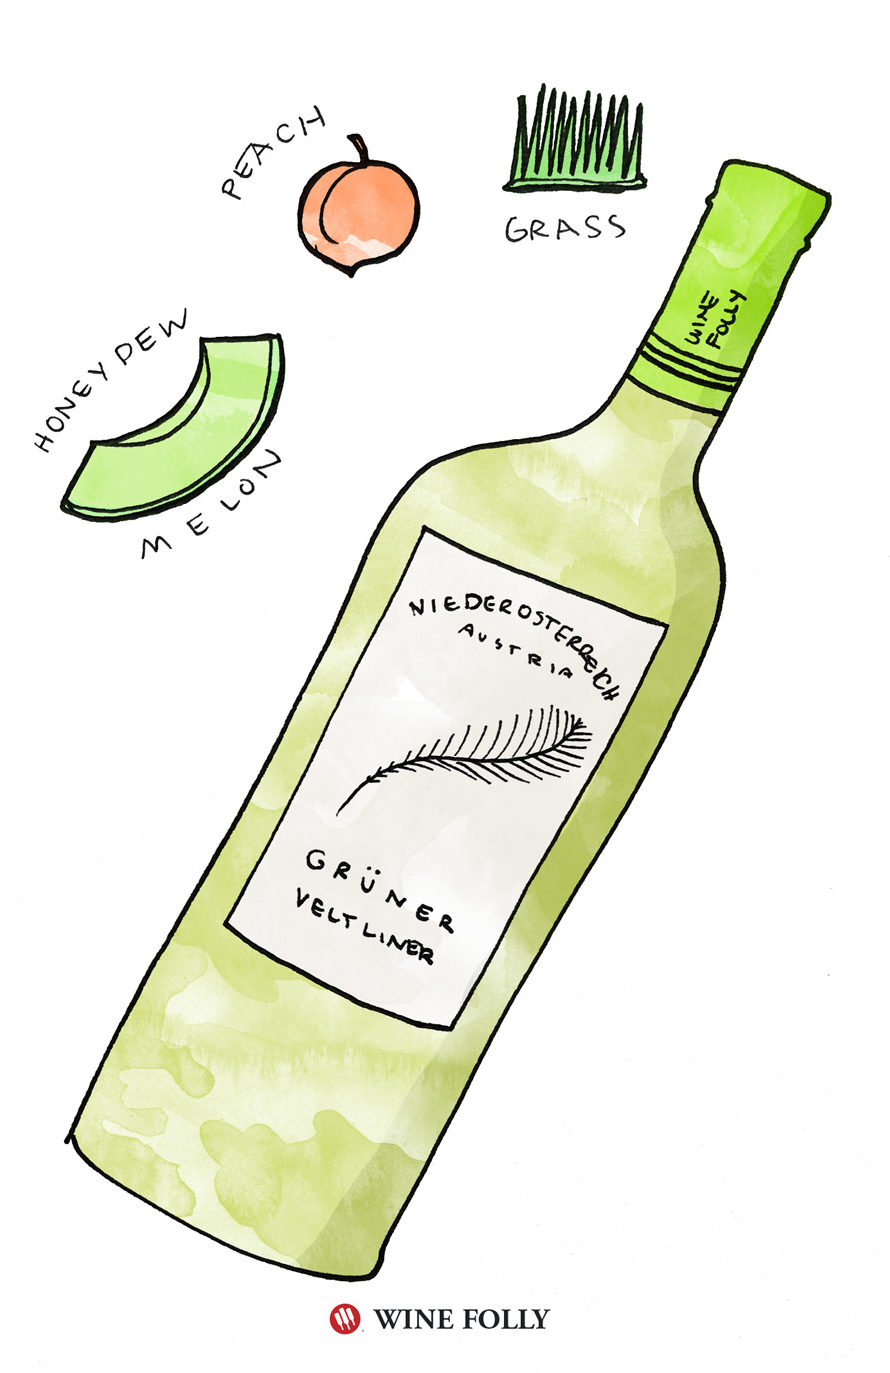 Gruner Veltliner Tasting Notes Illustration by Wine Folly